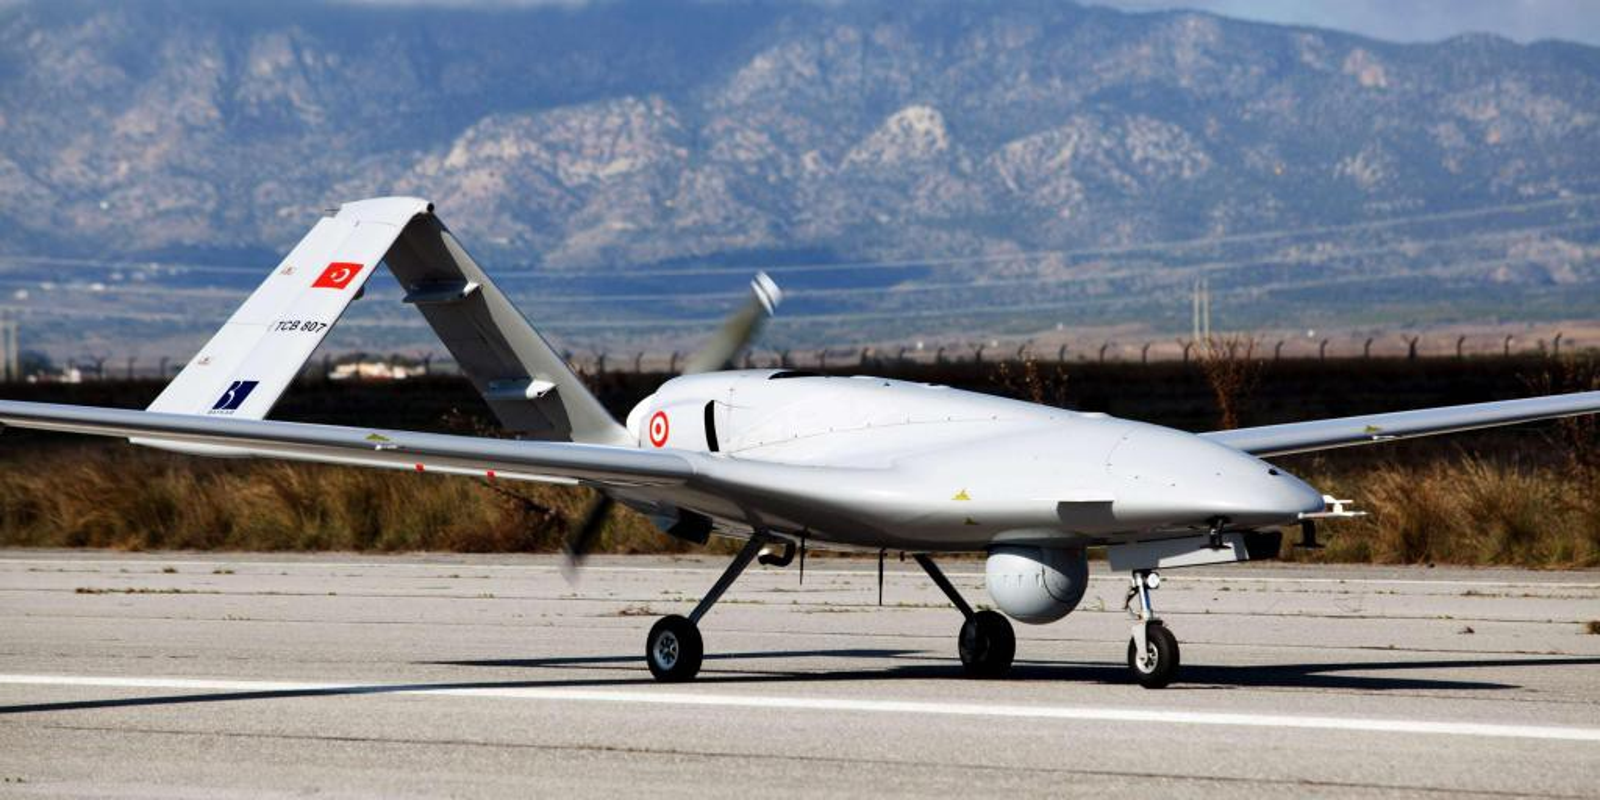 Dong minh cua Nga mua UAV TB2 Tho Nhi Ky: Chieu bai cao tay?-Hinh-6